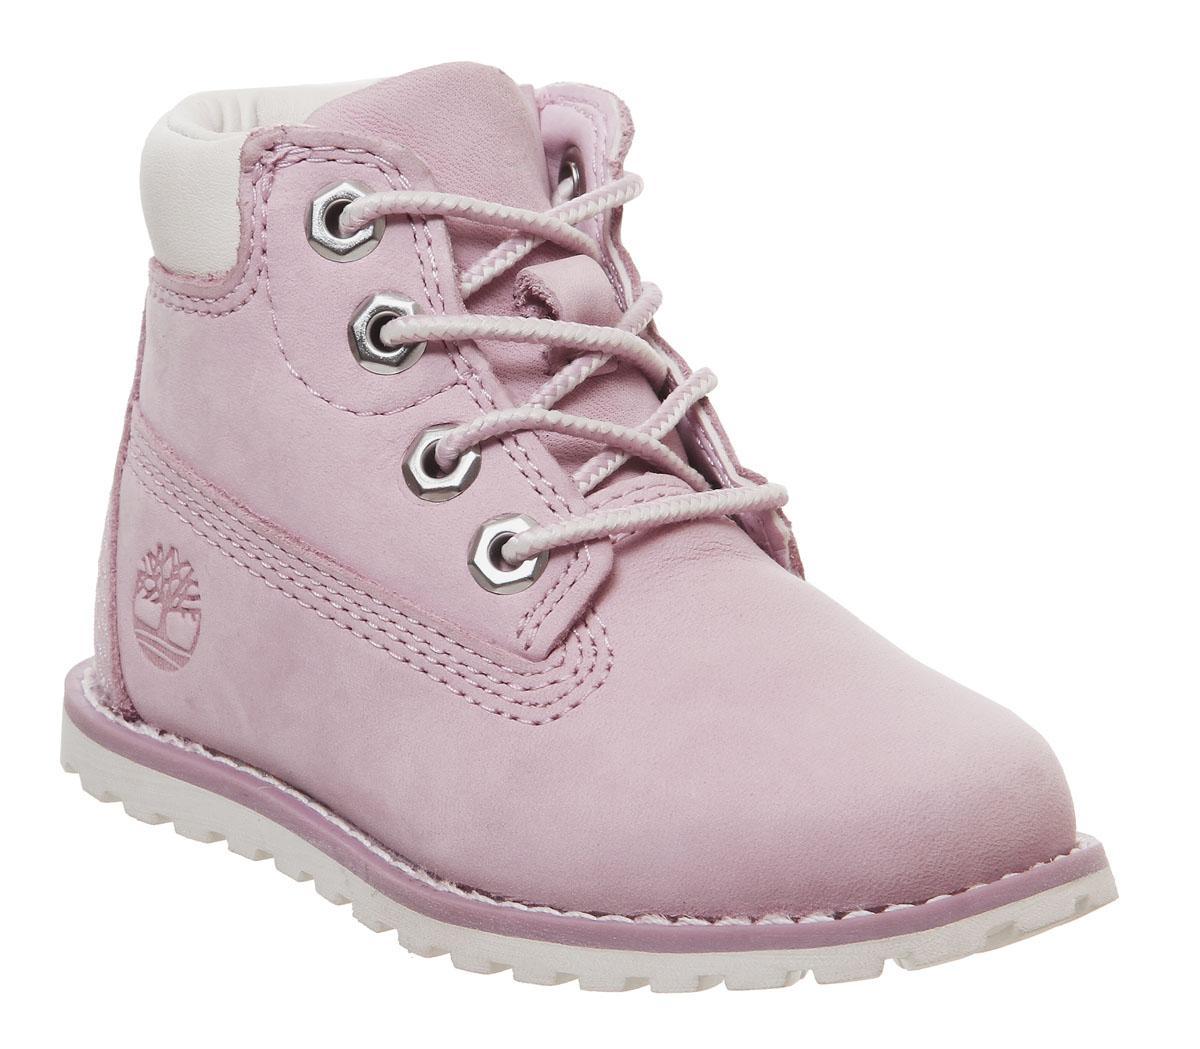 Nursery Timberland Pokey Pine 6 Inch Pink Zip Boots RRP £54.99